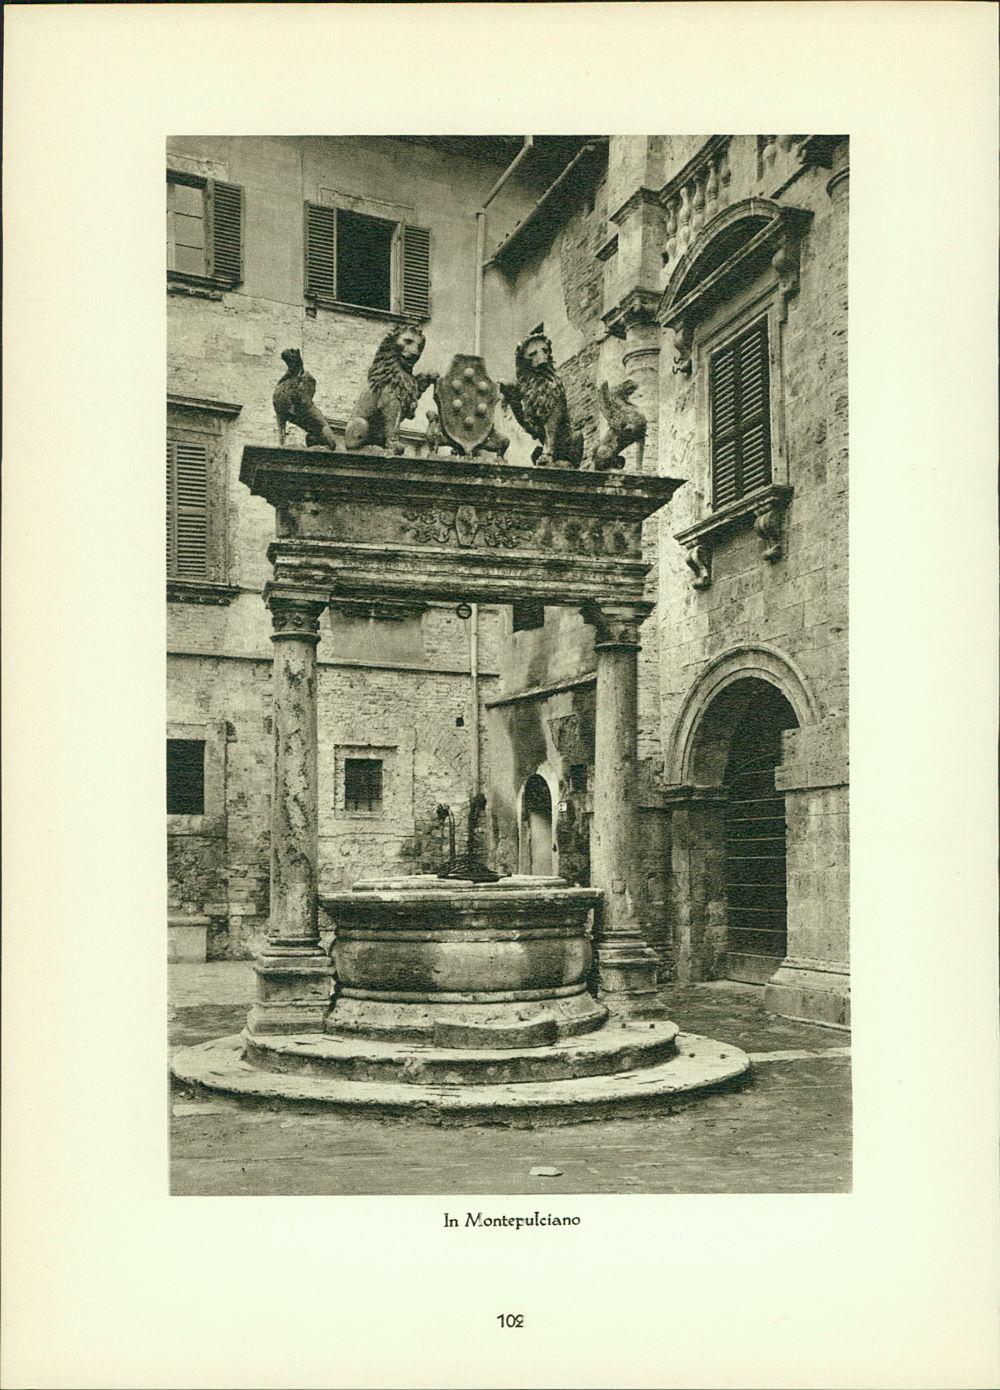 Hielscher, Kurt: Kupfertiefdruck : Fabriano - Palazzo del Podesta - In Montepulciano Stadtansichten.